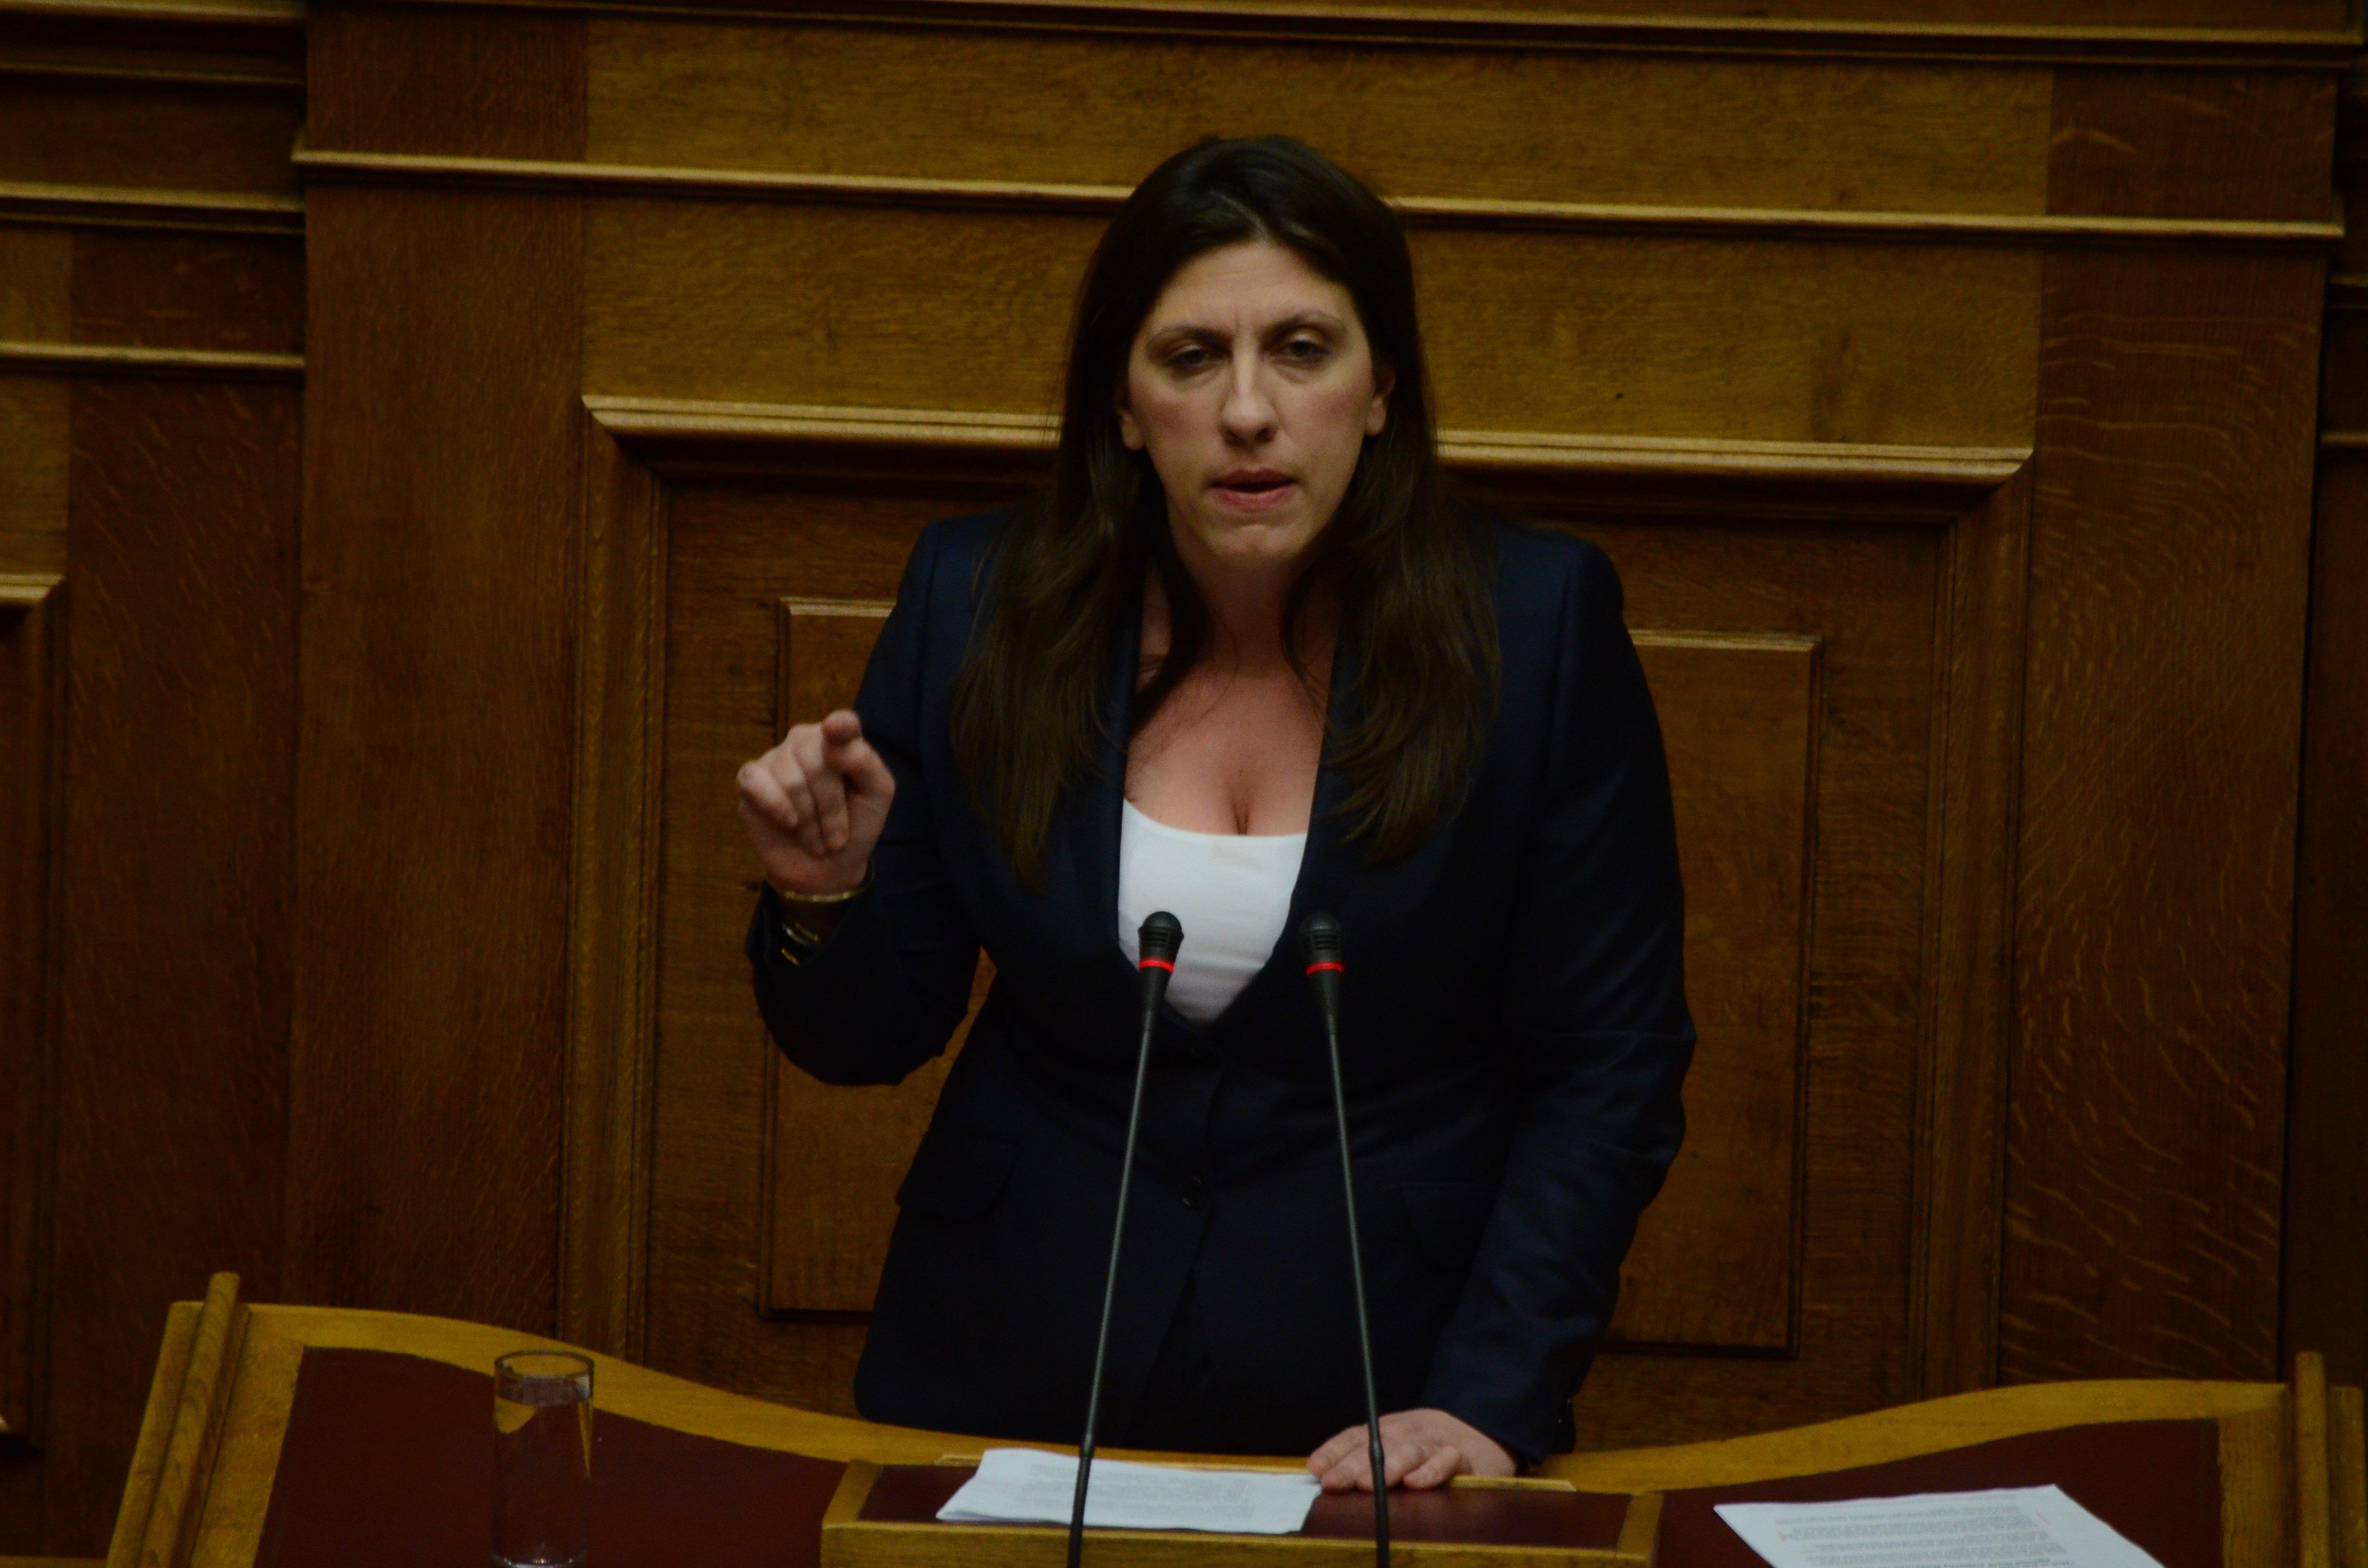 Former president of the Greek parliamet Zoi Konstantopoulou